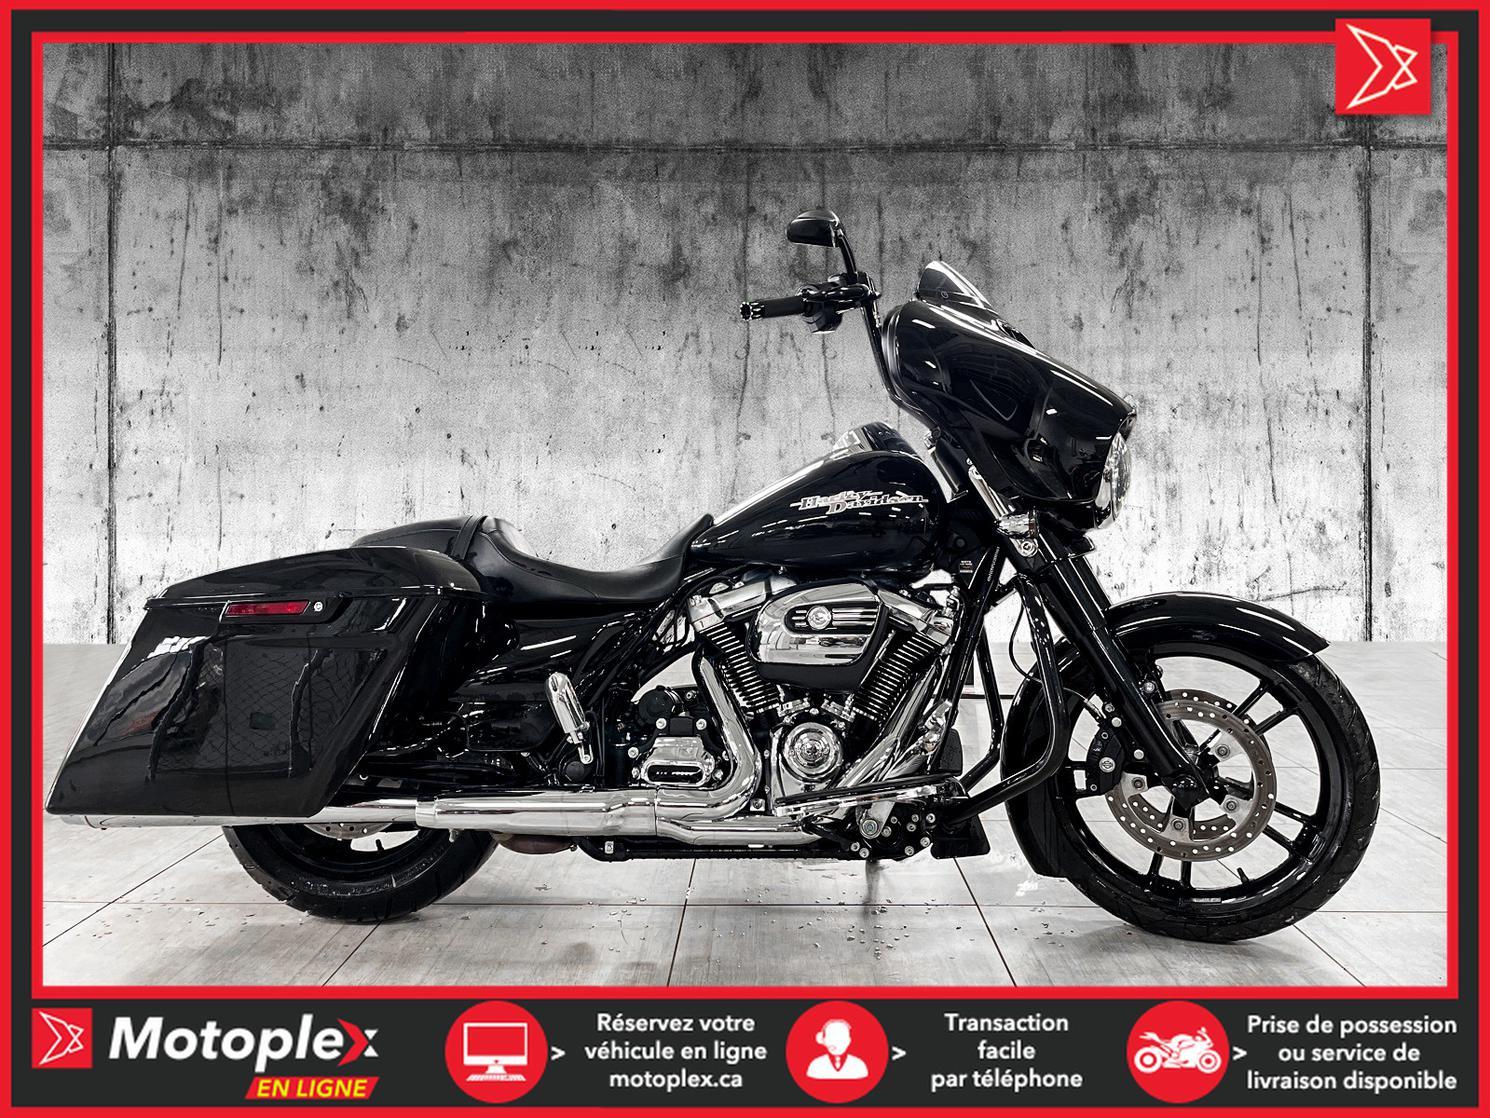 2018 Harley-Davidson FLHXS STREET-GLIDE 71$/semaine